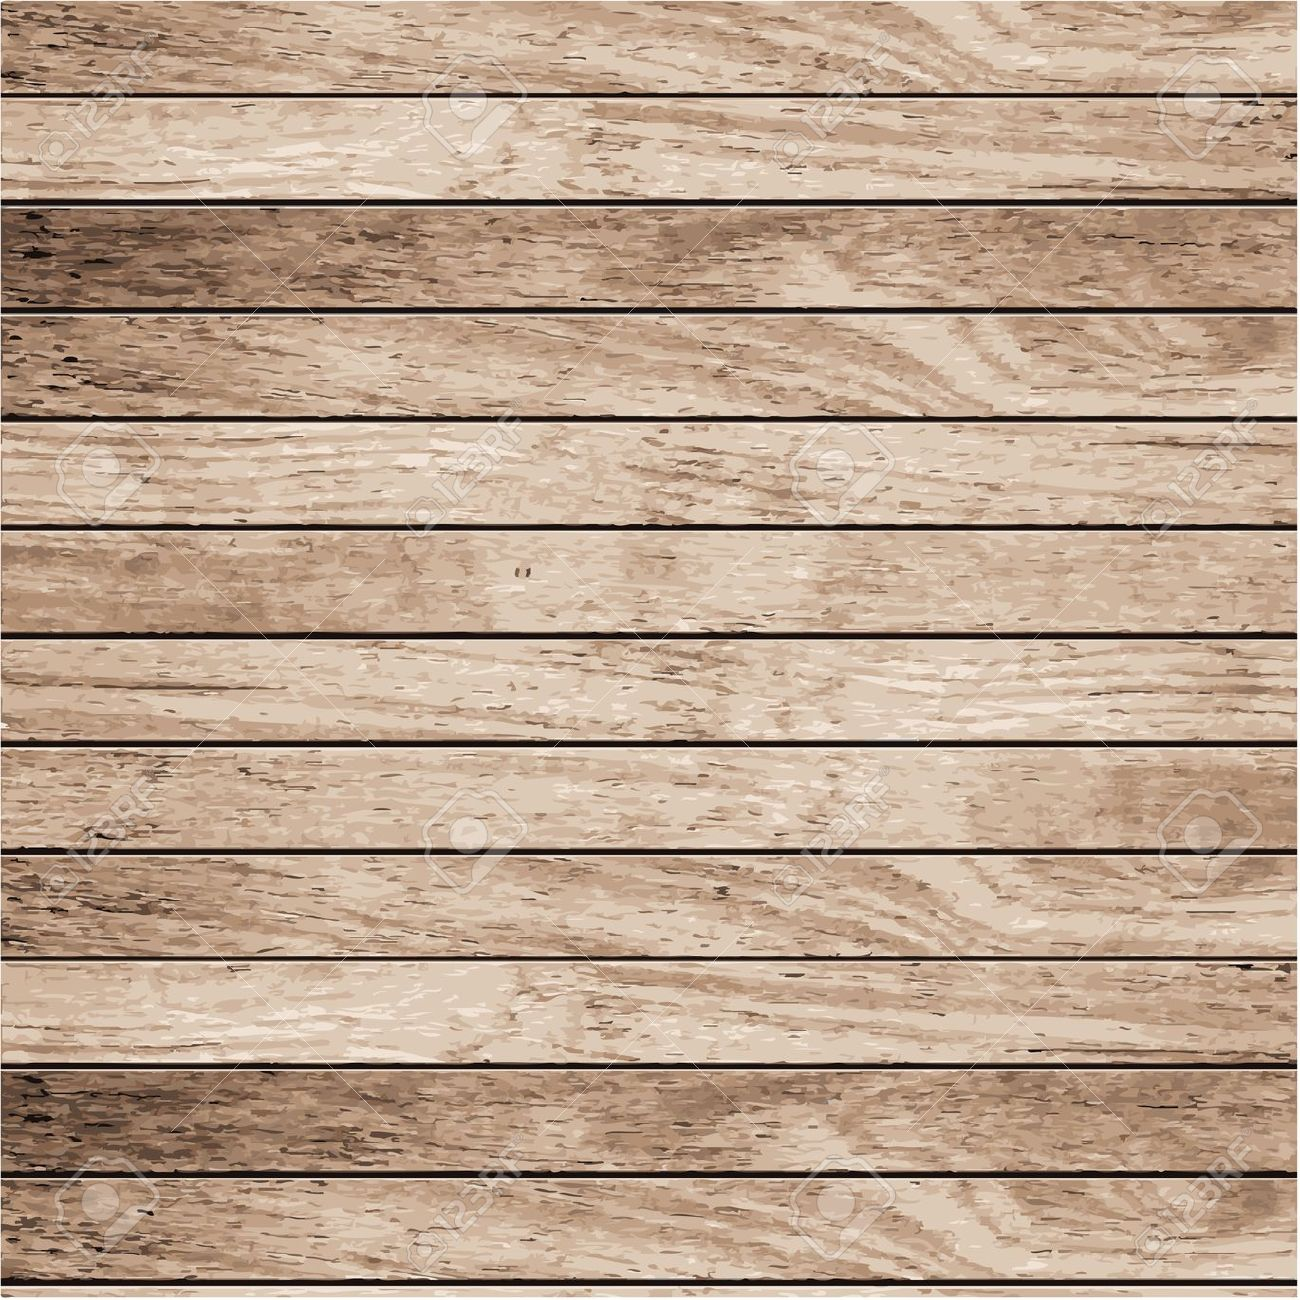 Rustic wood clipart